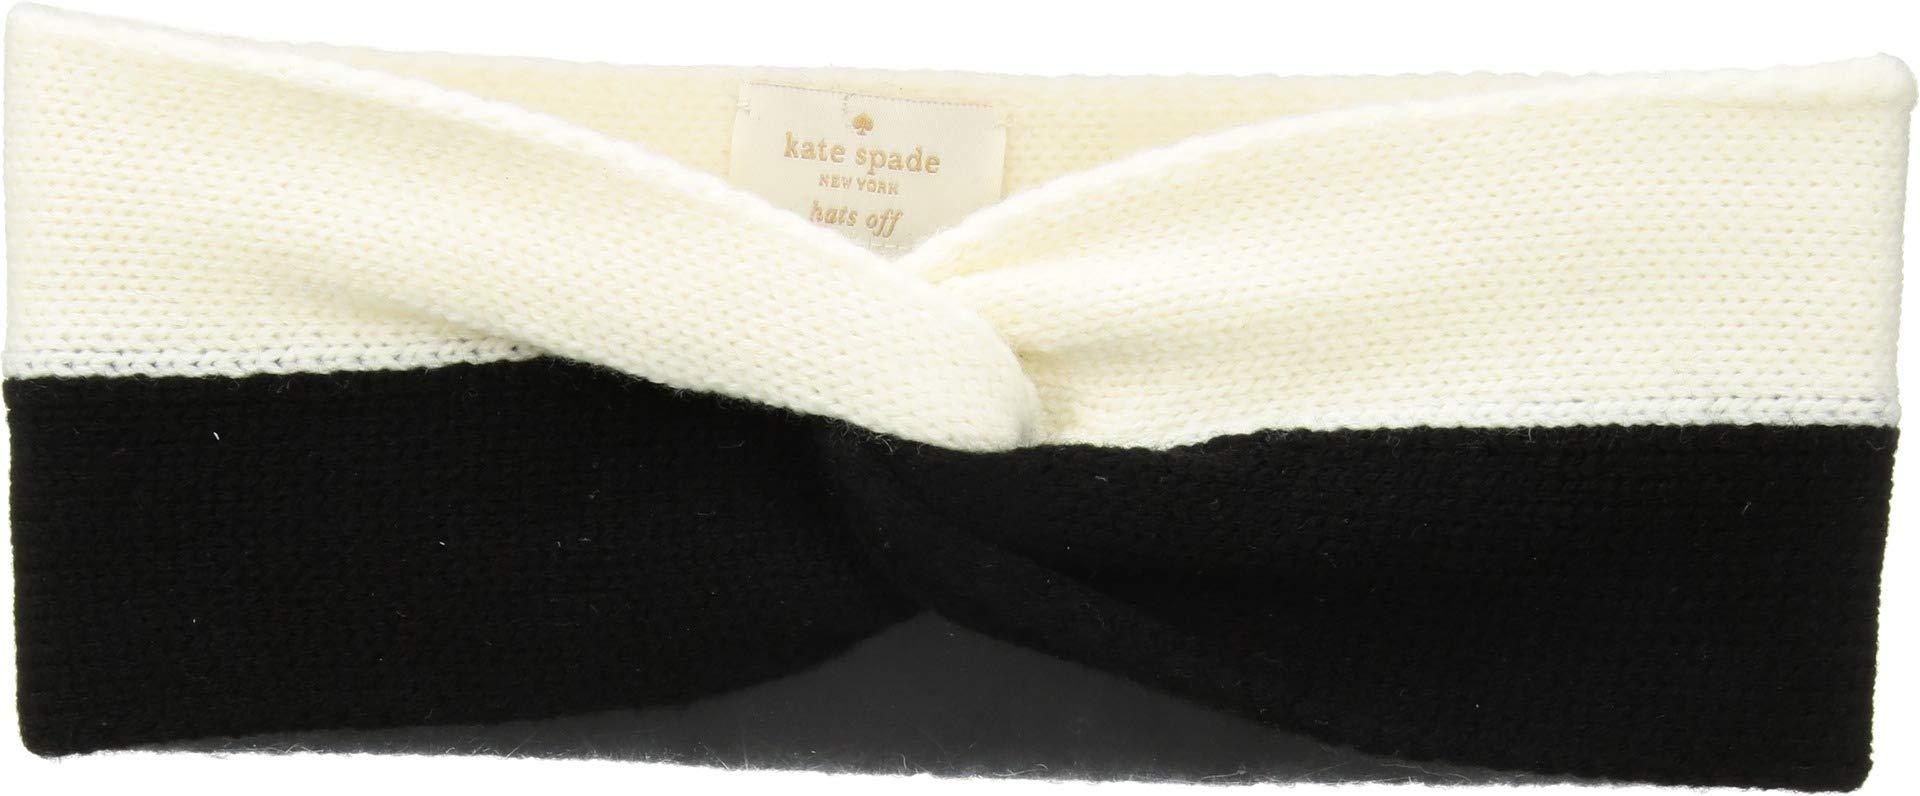 Kate Spade New York Women's Striped Headband, Black/Cream, One Size